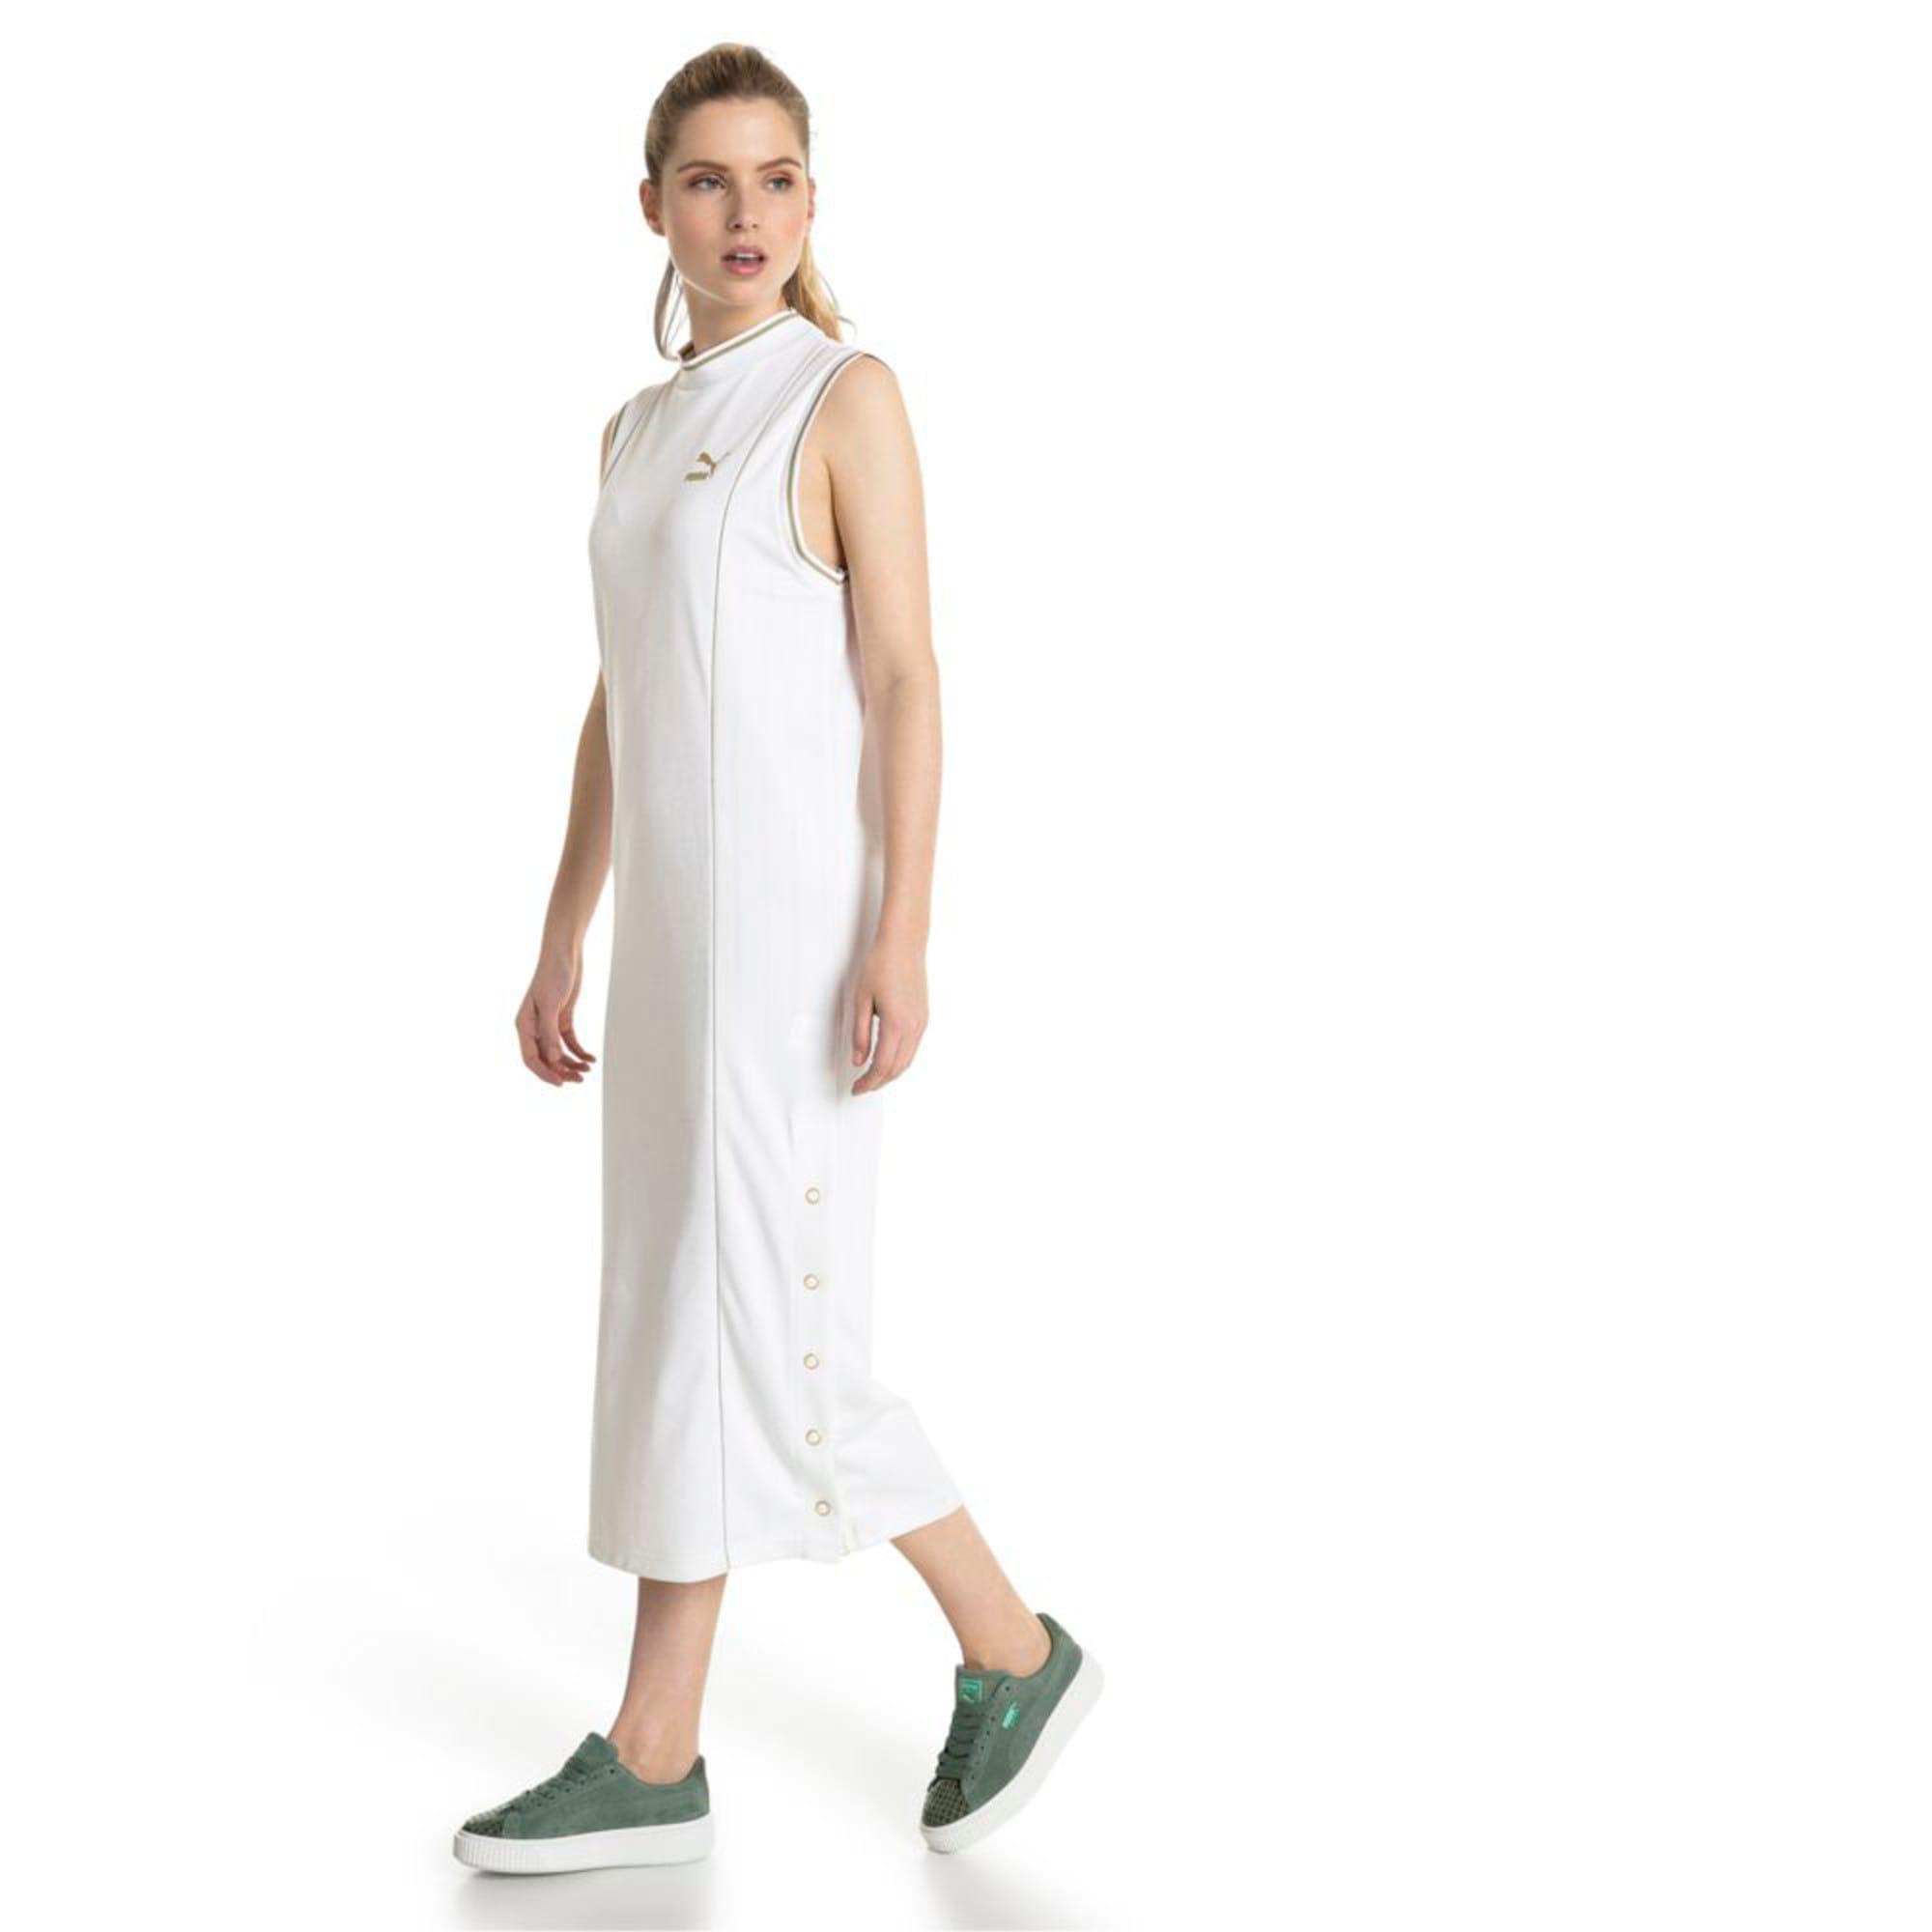 Thumbnail 4 of Retro Women's Dress, Puma White, medium-IND